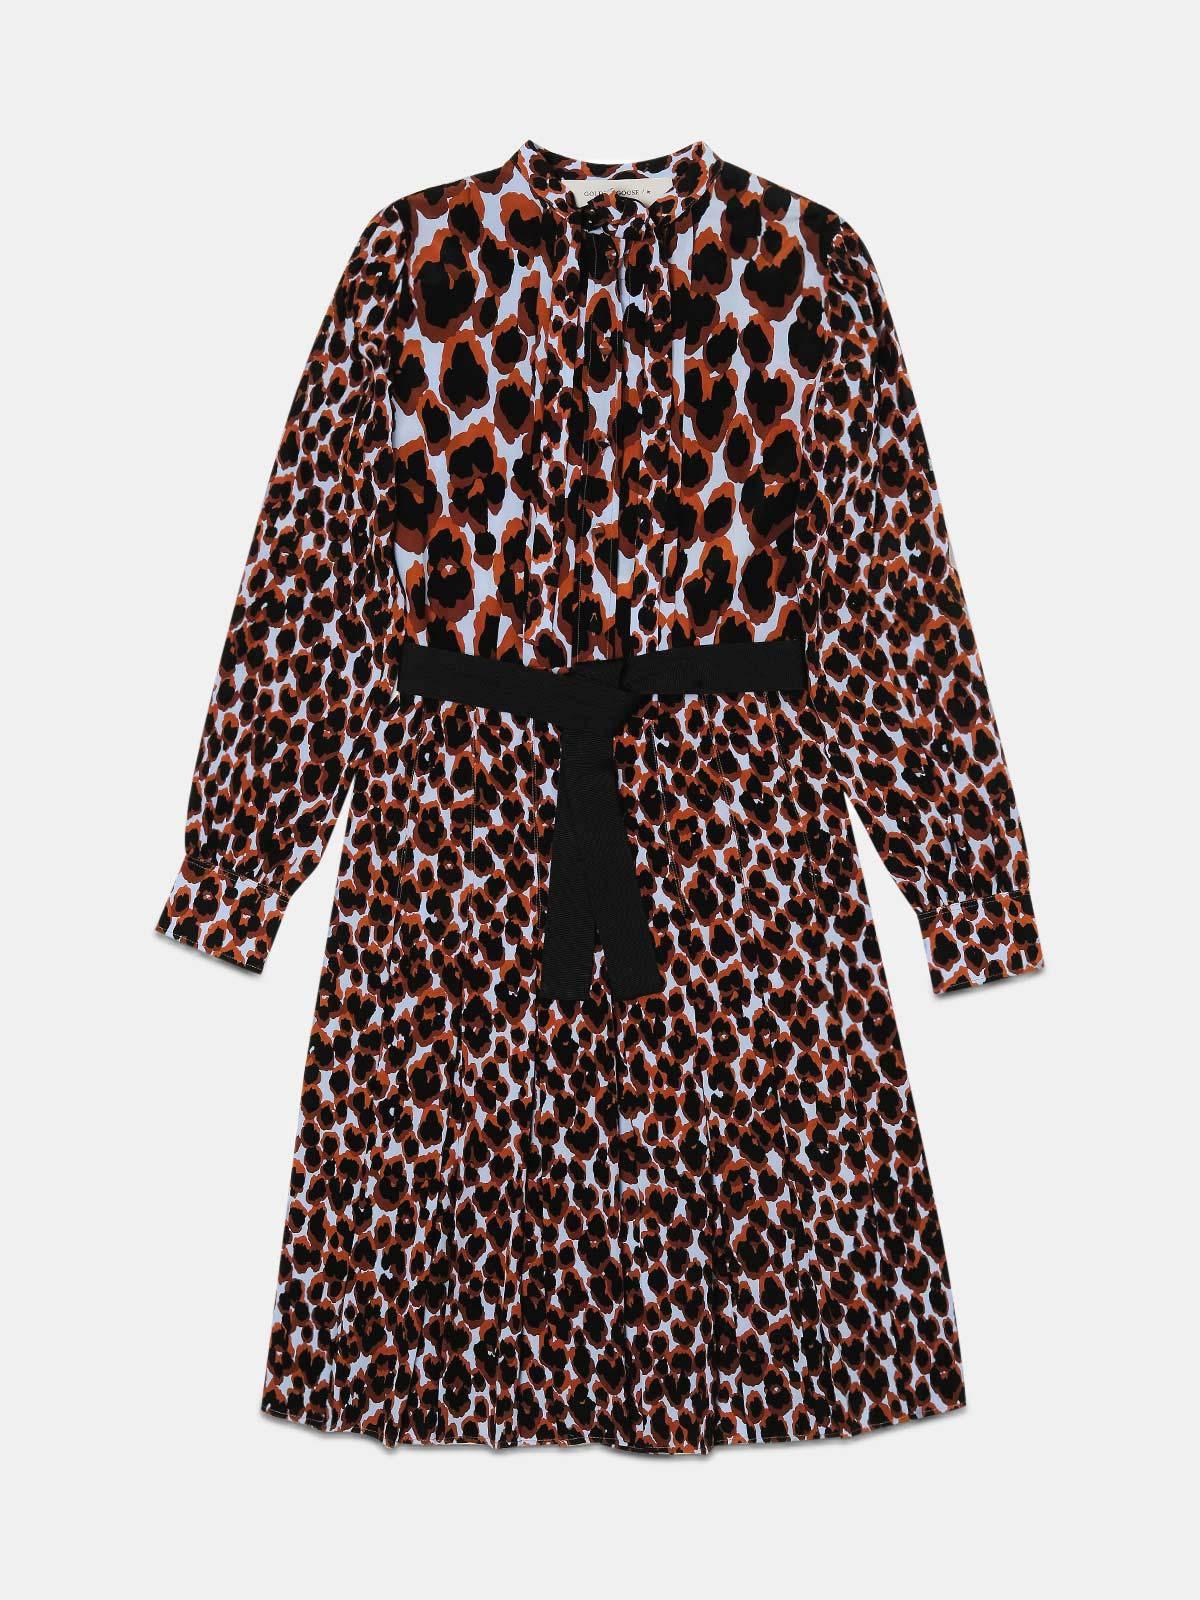 Aida dress with leopard print